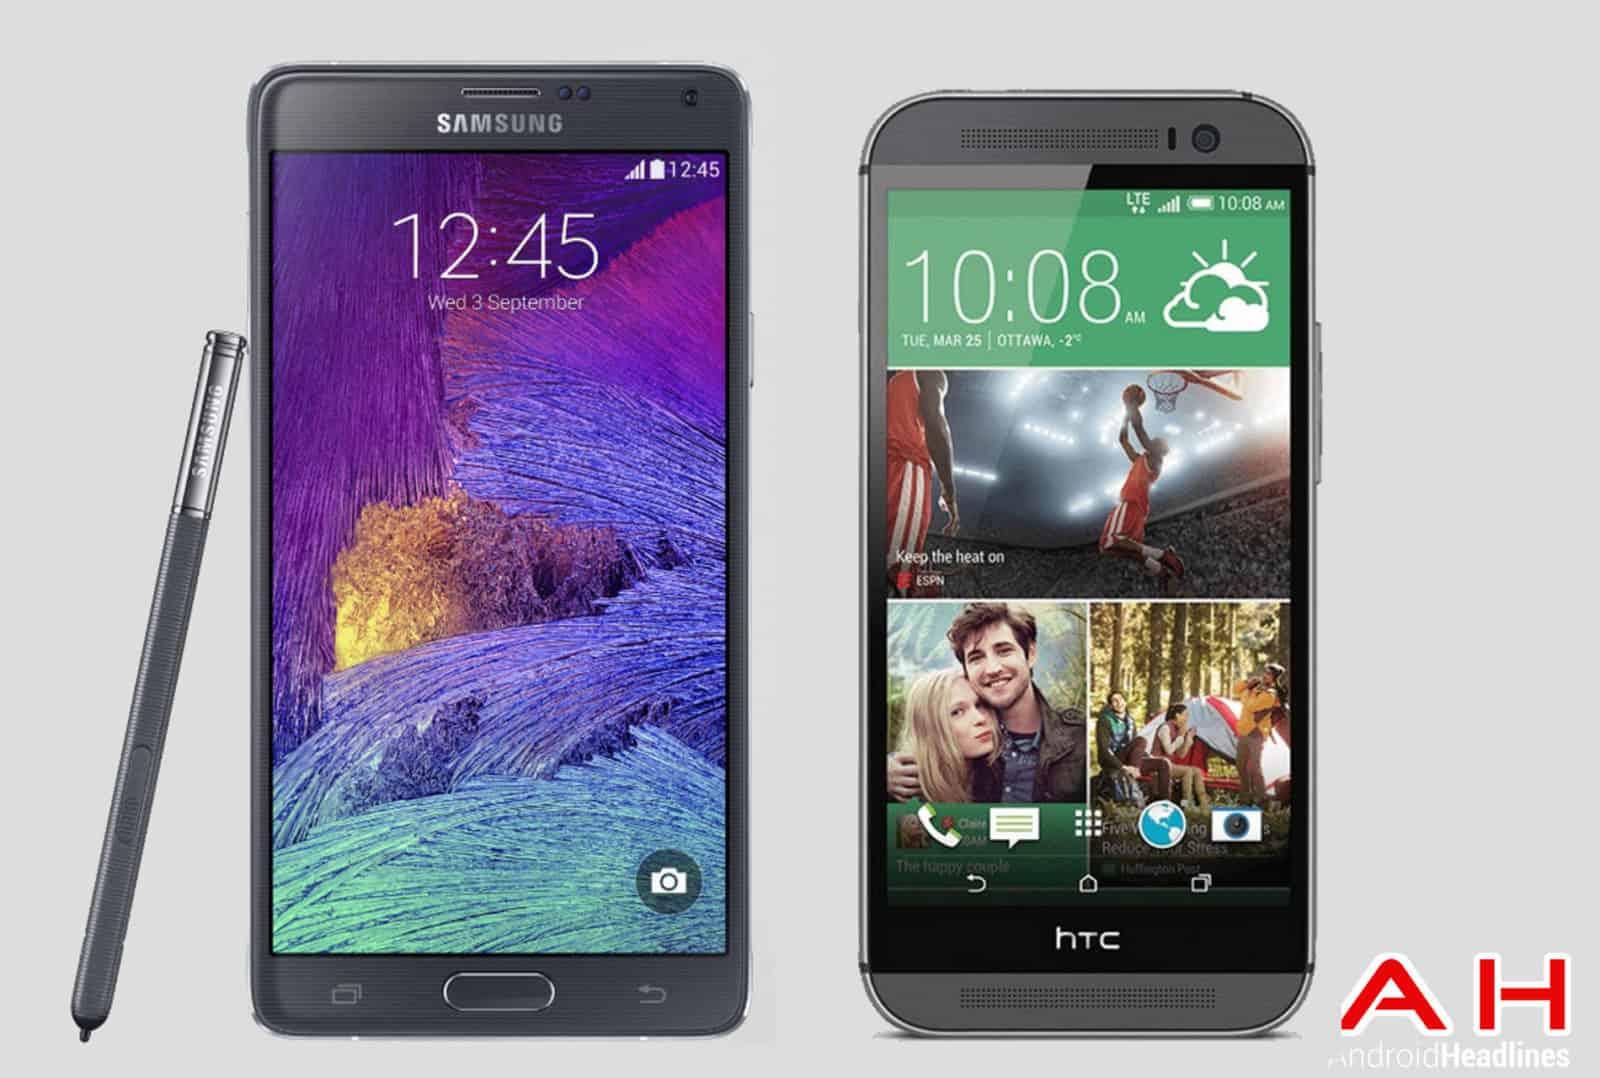 Note 4 vs HTC One M8 AH 2